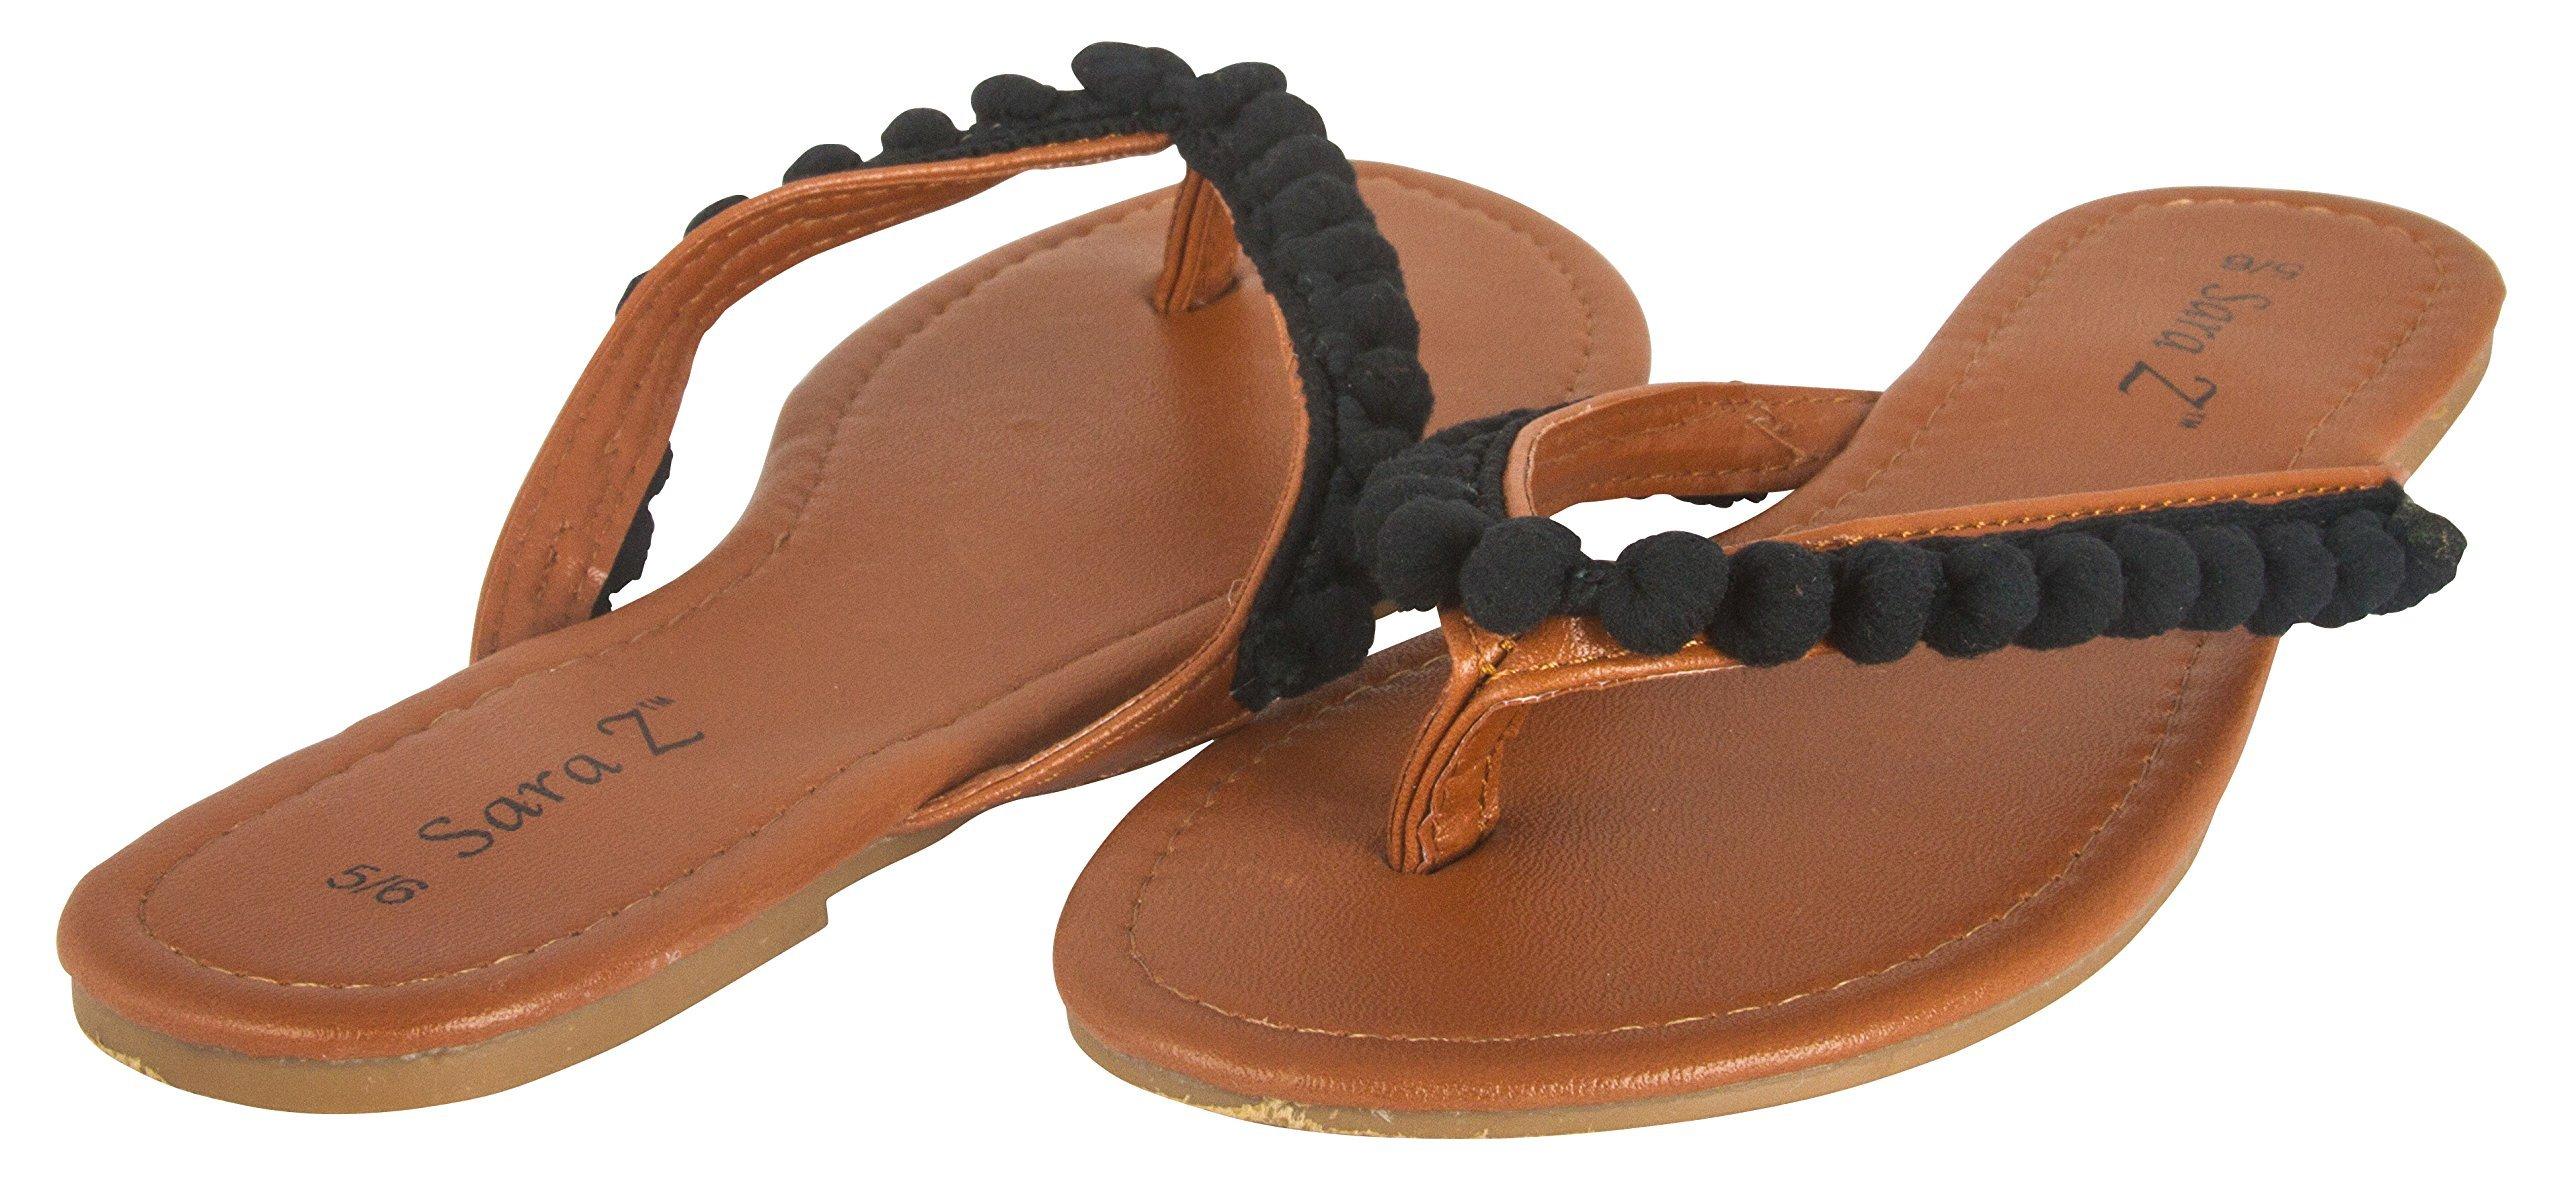 Sara Z Ladies Pom Pom Thong Sandal 11 Black